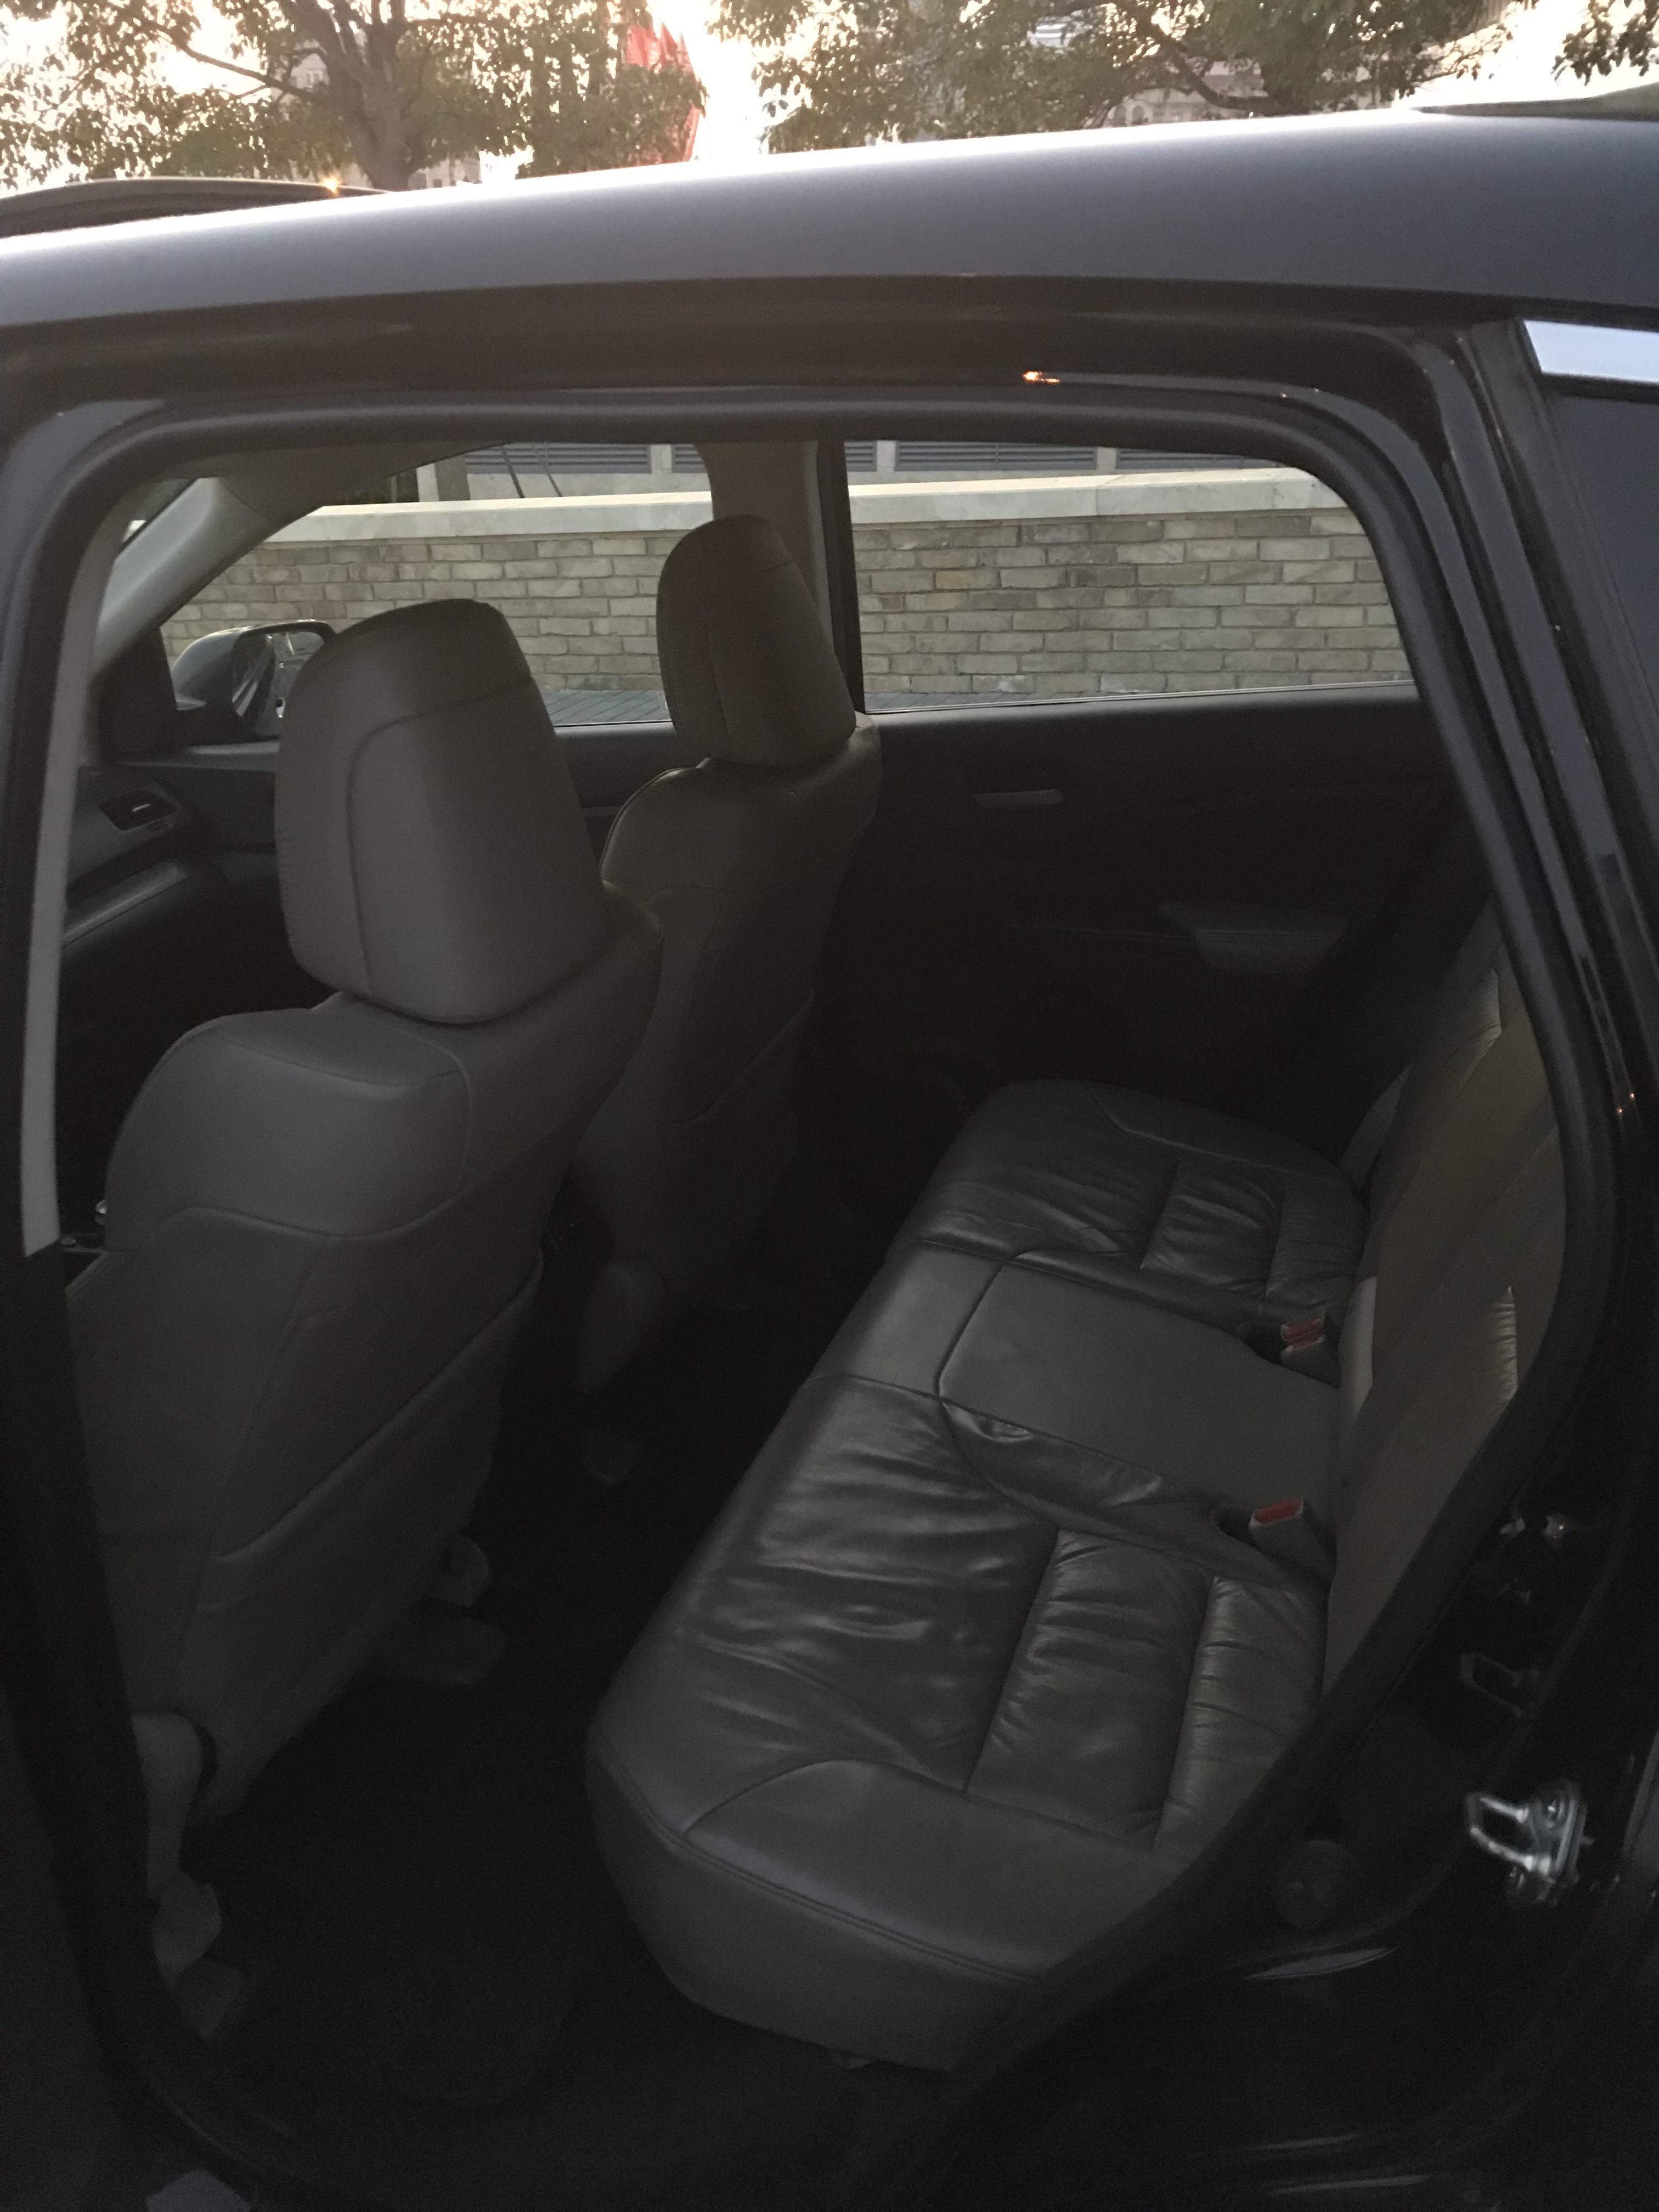 Honda CR-V 2.4(lt) 2012 Подержанный  $17500